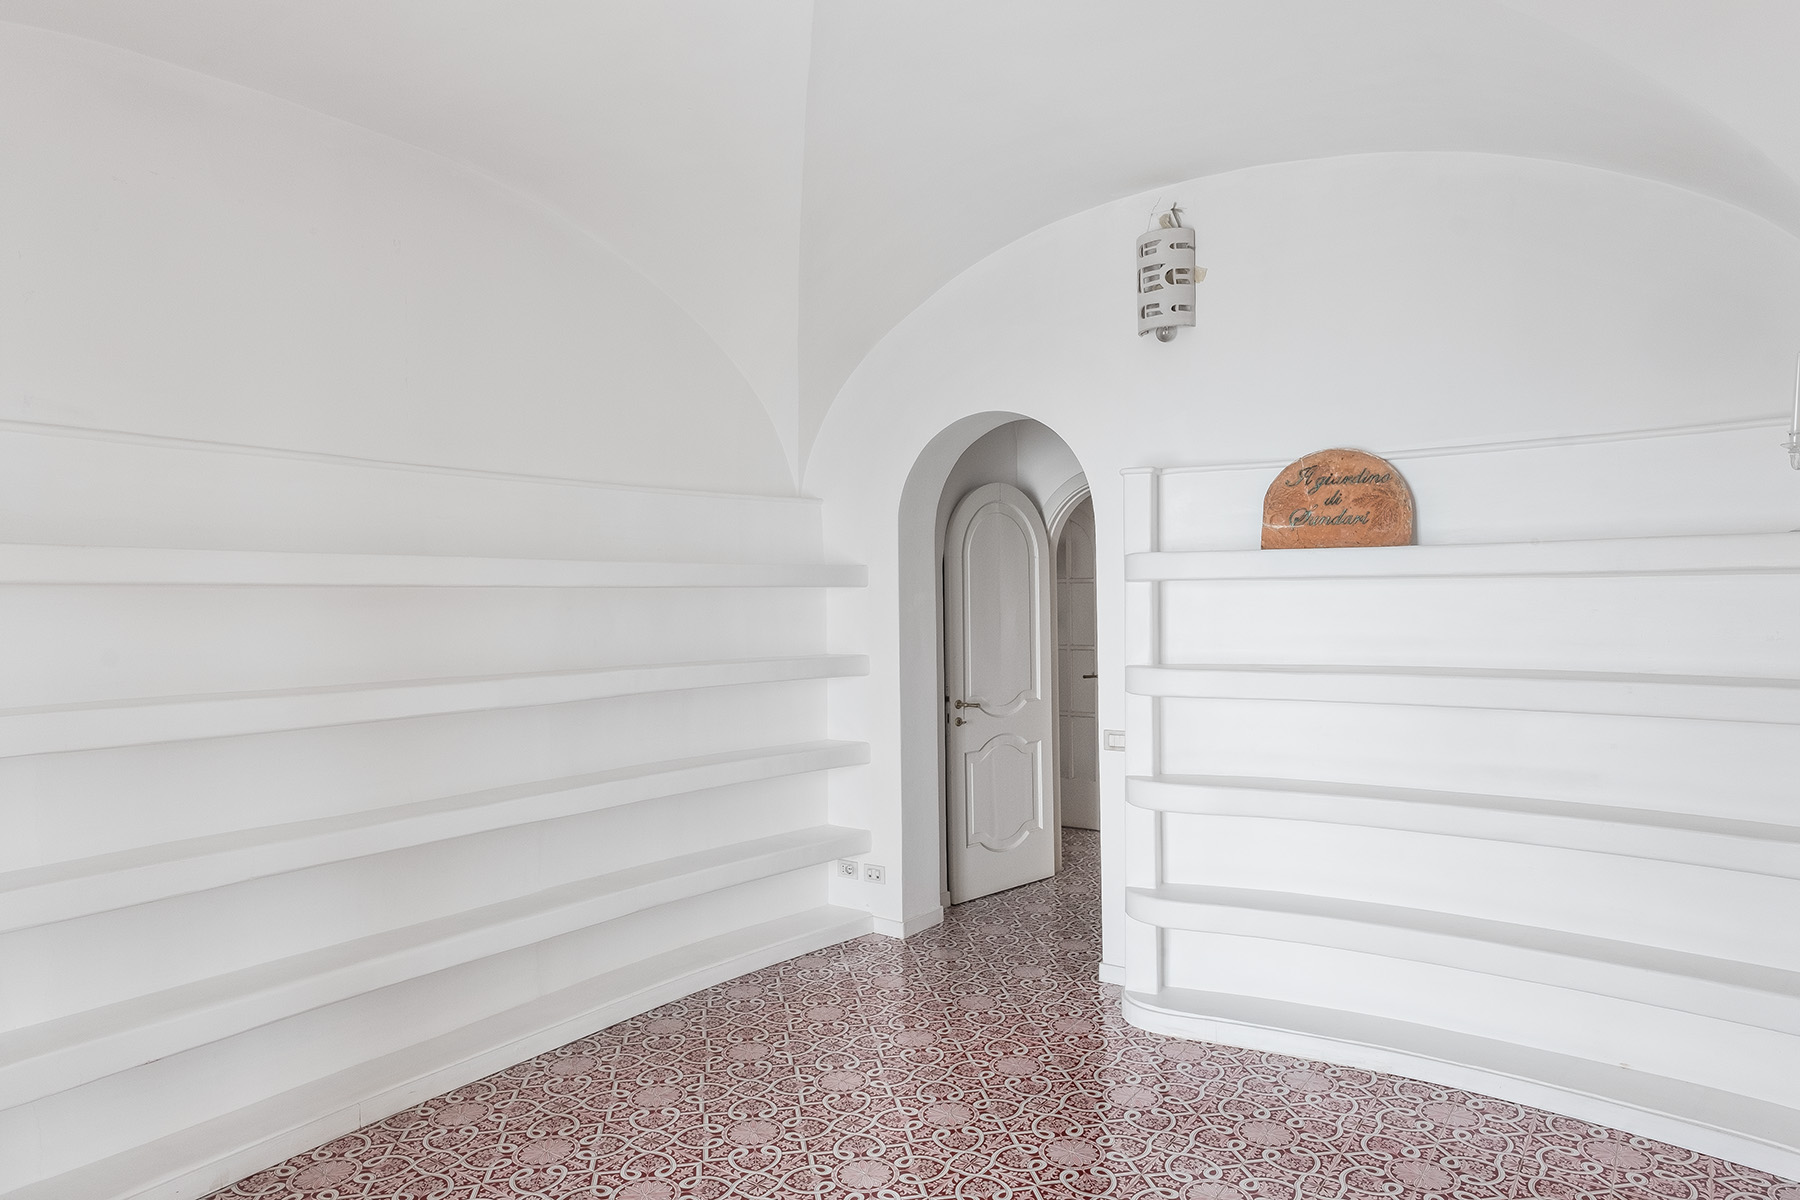 Casa indipendente in Vendita a Praiano: 4 locali, 250 mq - Foto 24